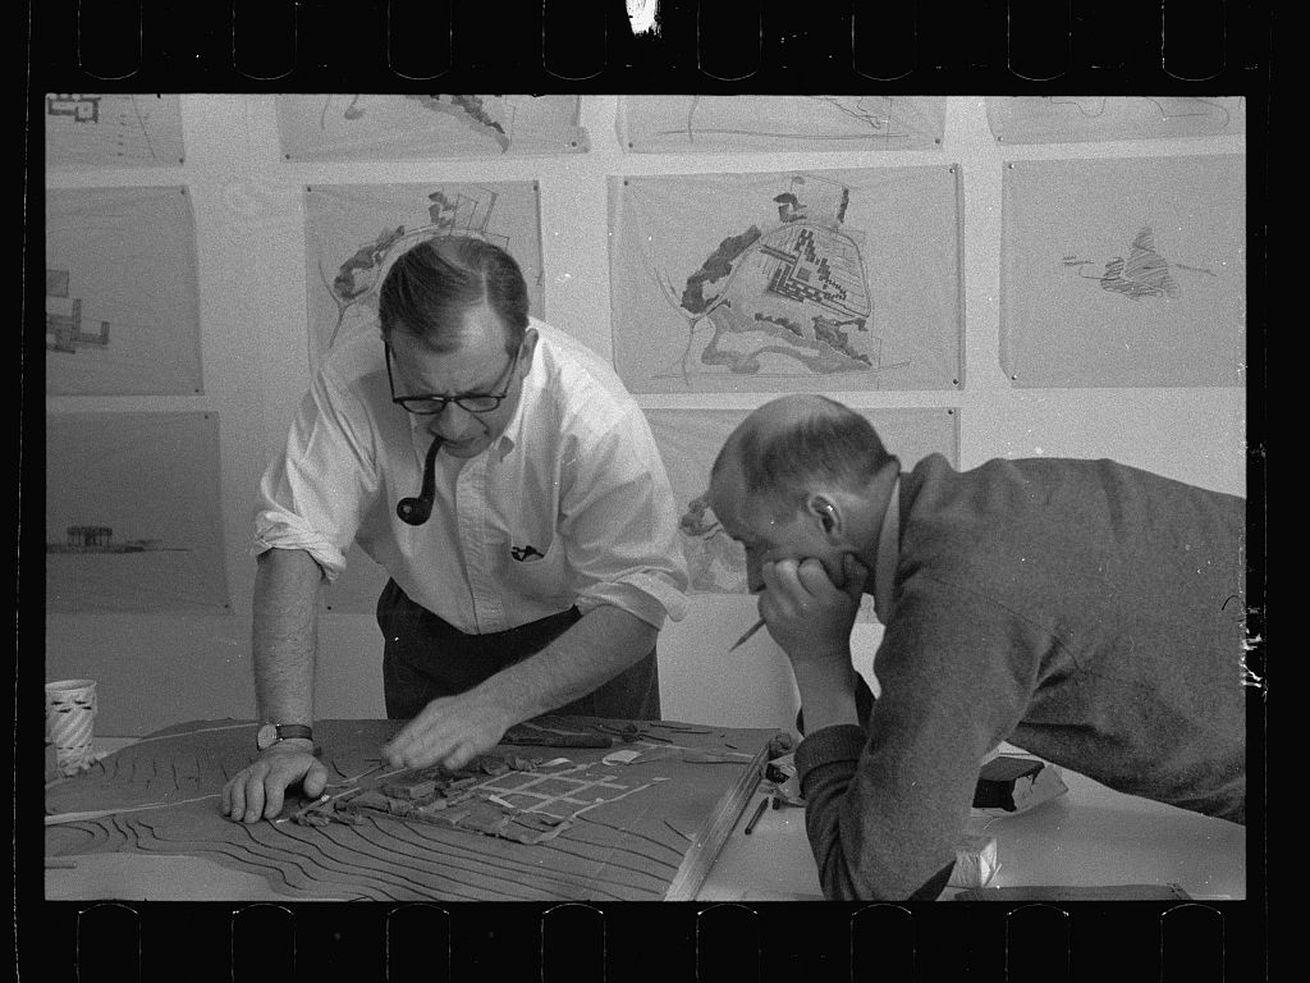 Eero Saarinen, with his ever-present pipe, working with Kevin Roche at Saarinen and Associates in 1953.